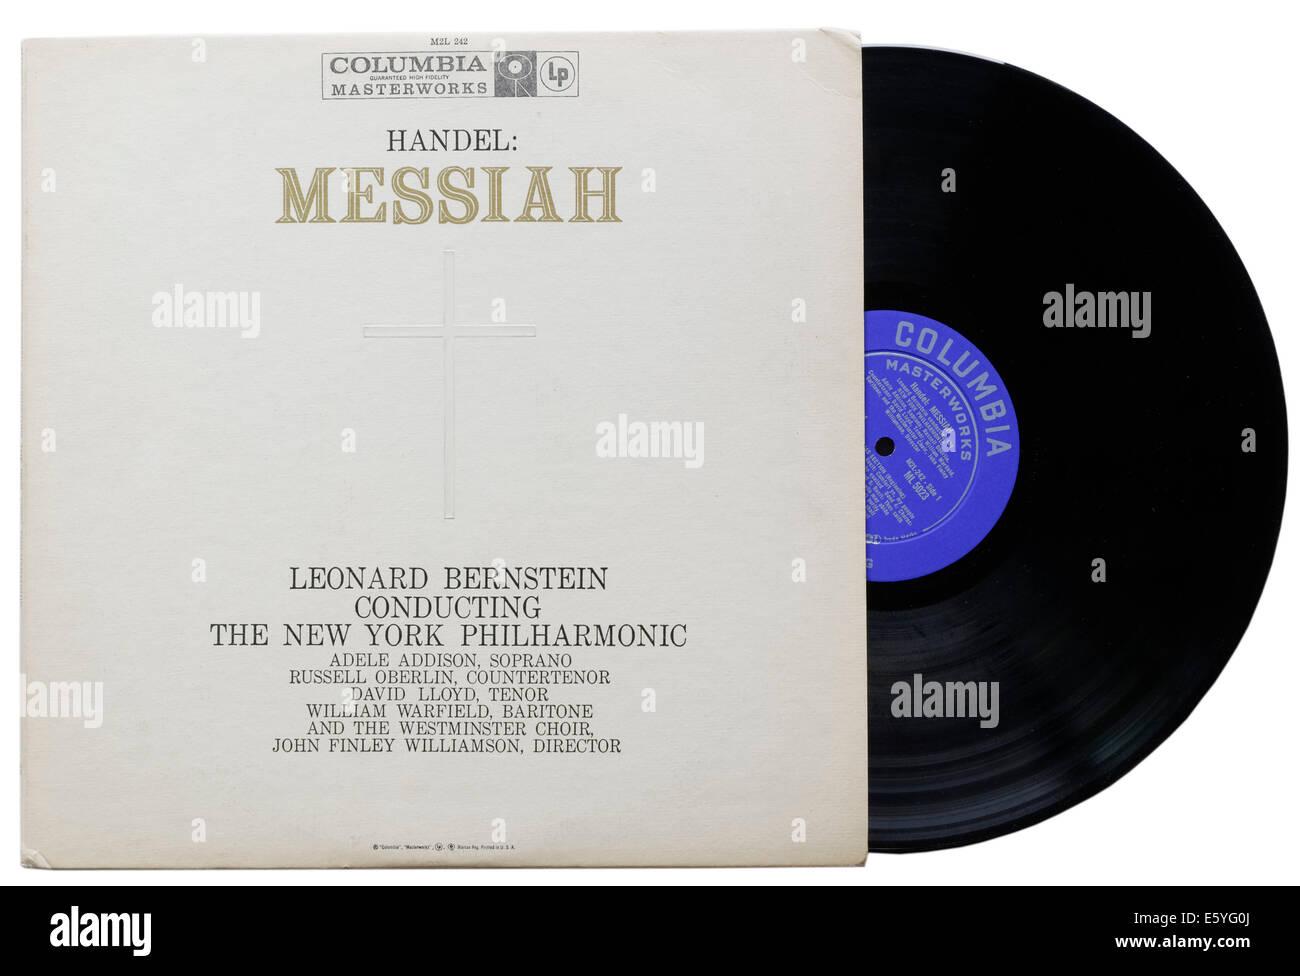 Handel's Messiah album, Leonard Bernstein conducting the New York Philharmonic - Stock Image